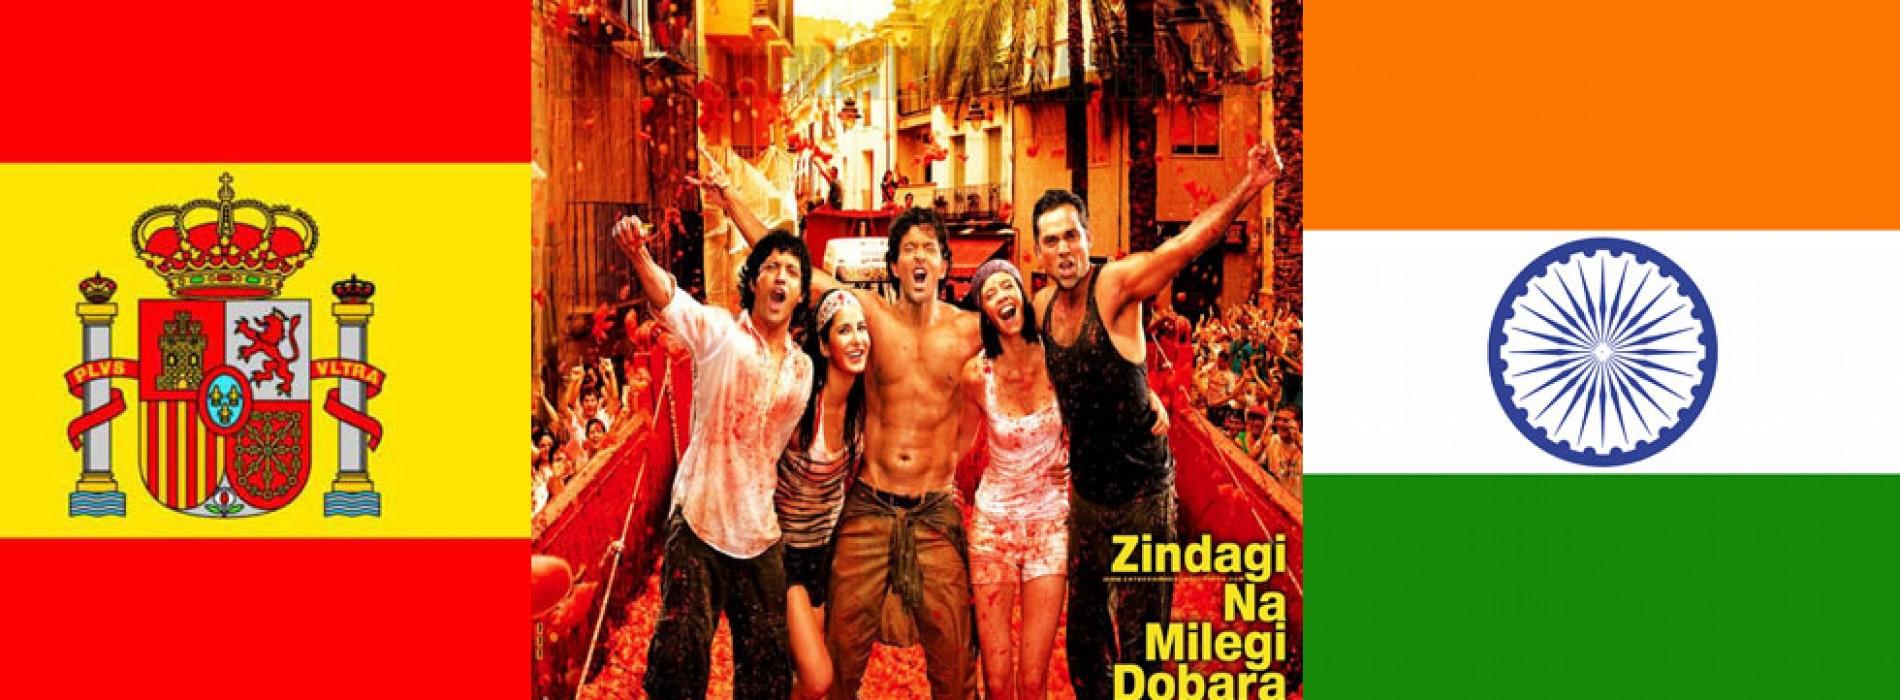 Spain to lure Indians through film tourism